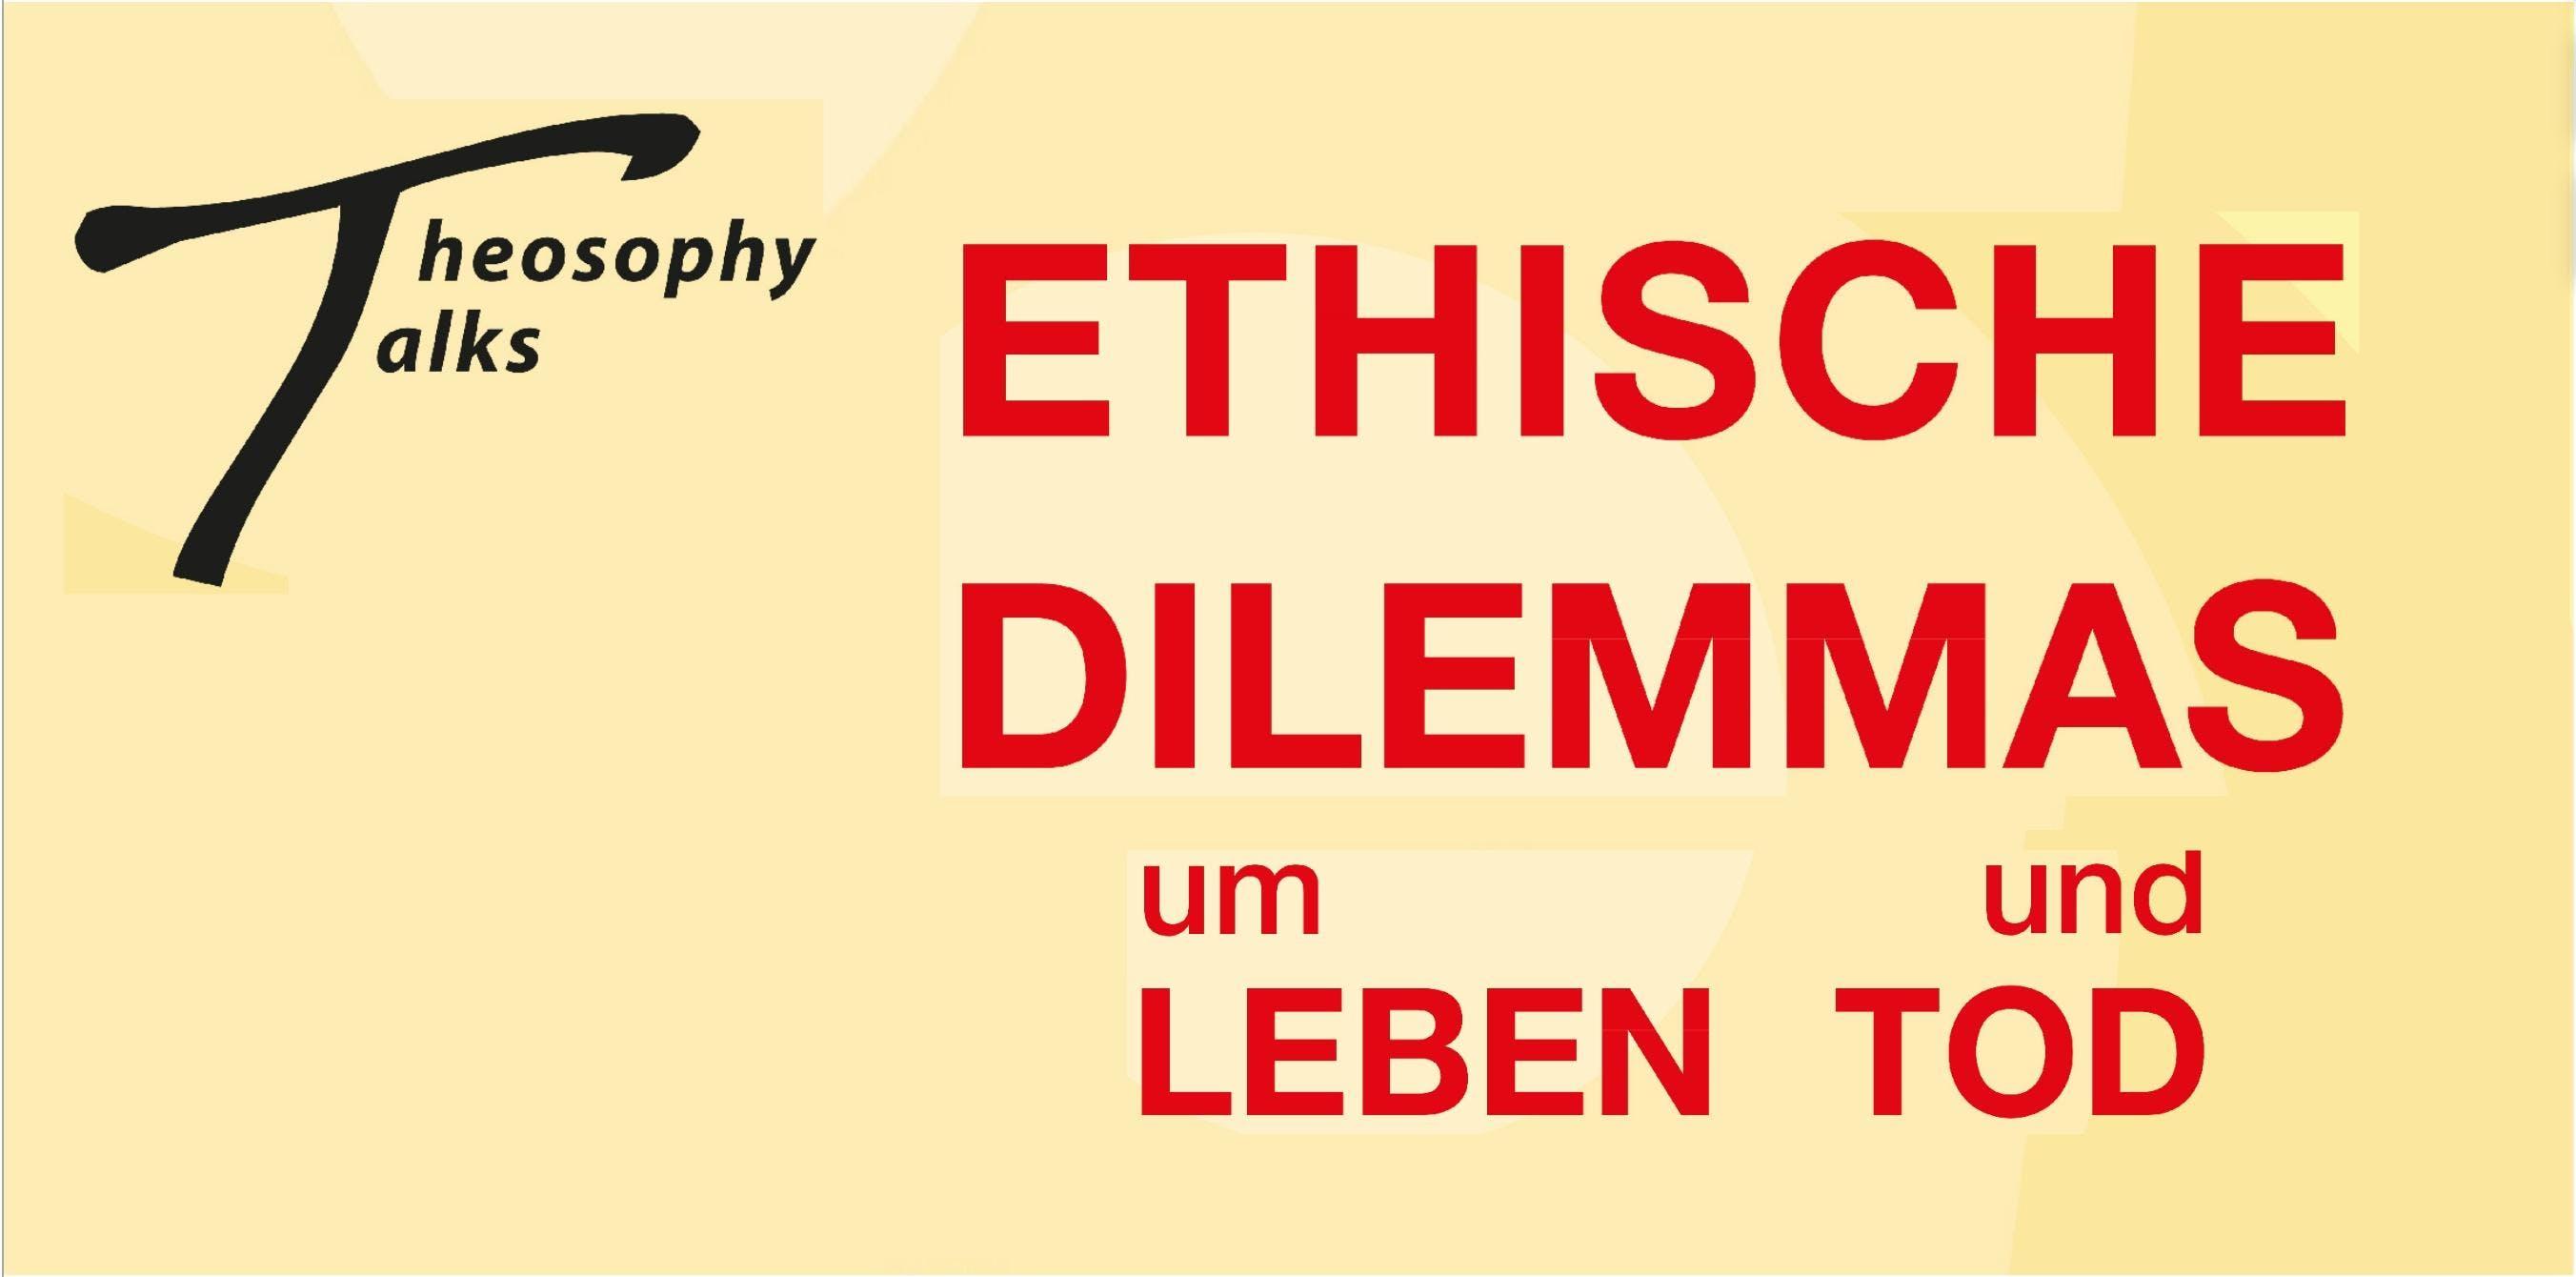 Theosophy Talks - Ethische Dilemmas um Leben